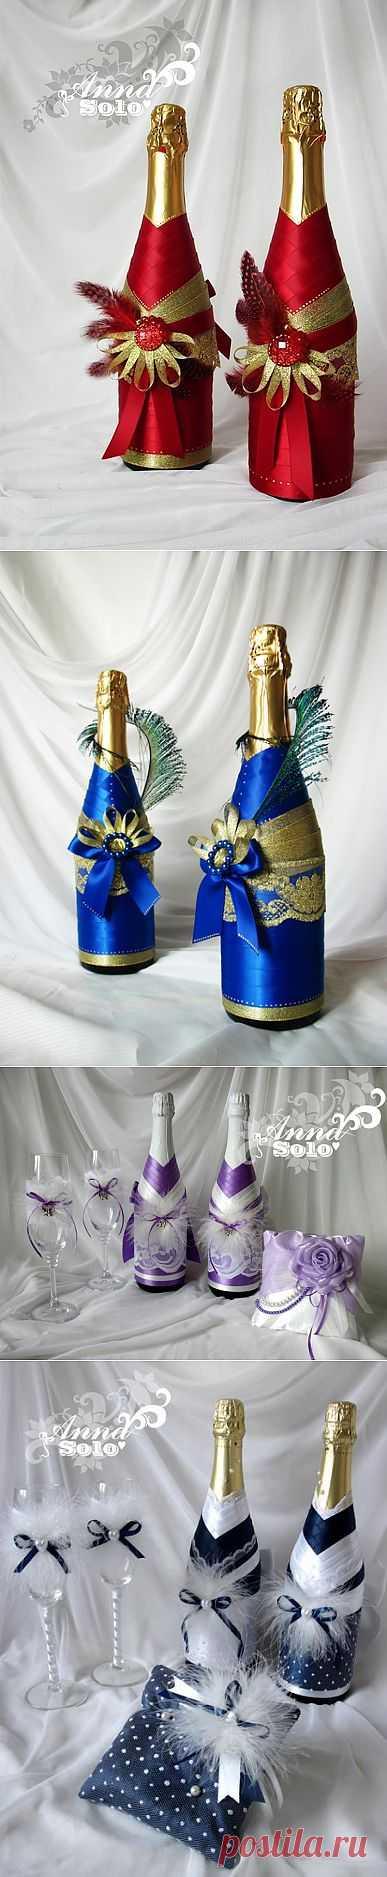 Декор бутылки атласными лентами